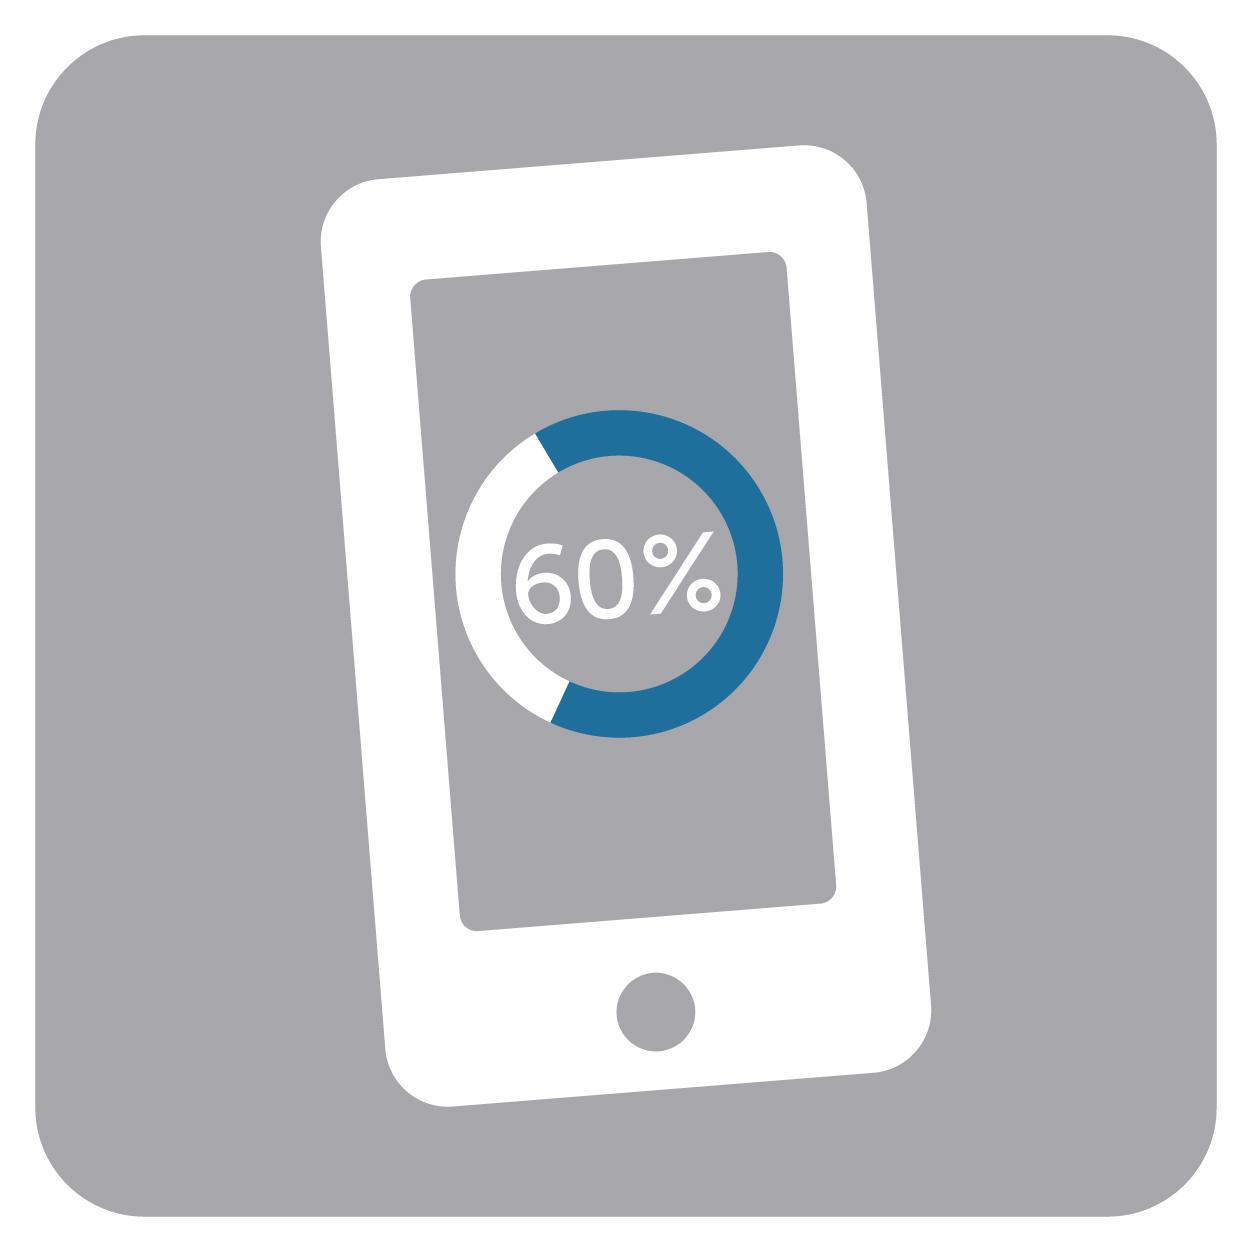 Mobile Job seekers 60%